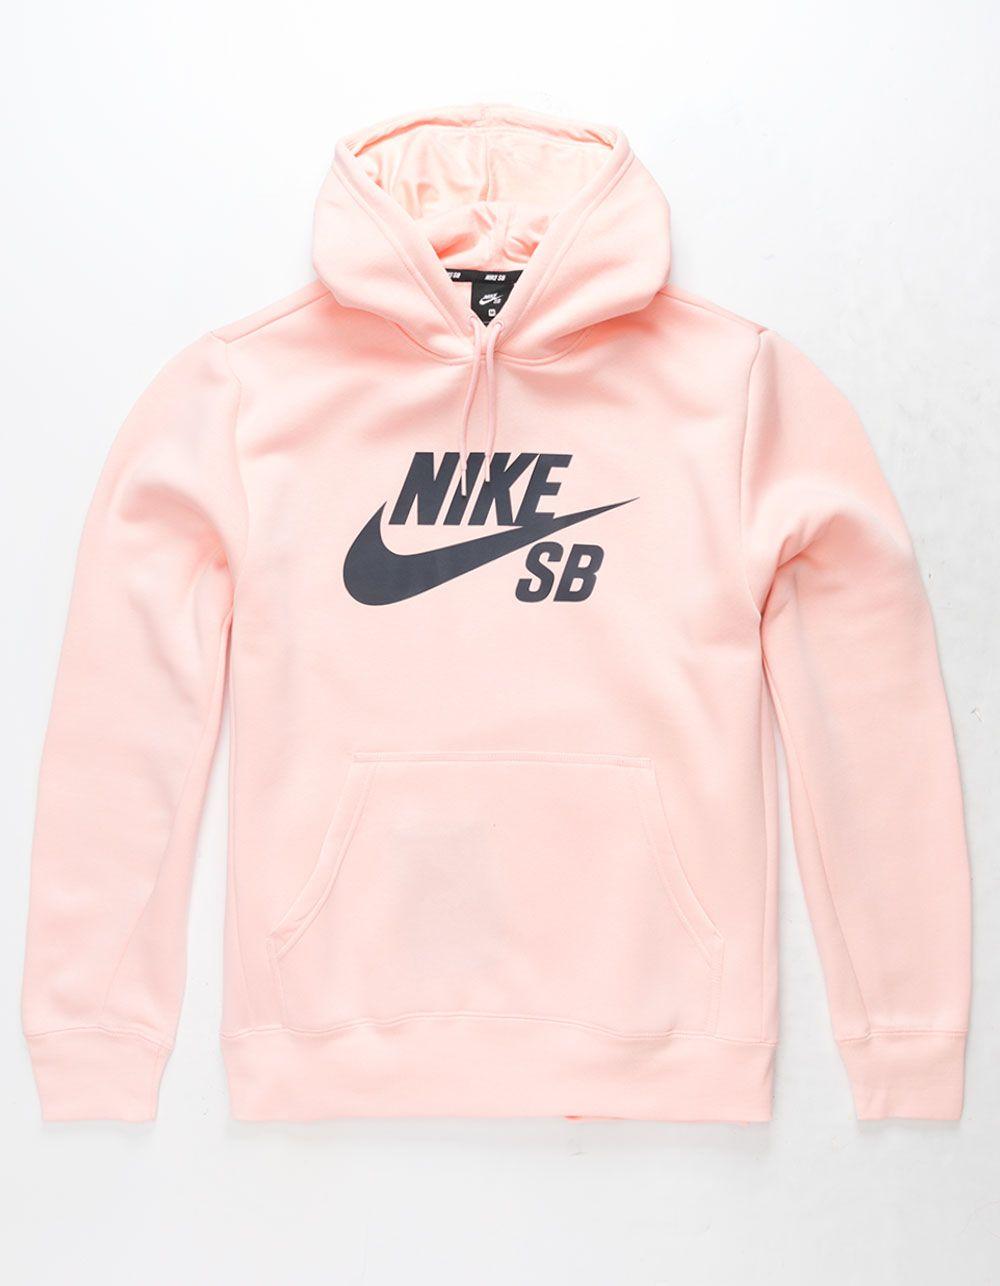 Predownload: Nike Sb Icon Pink Mens Hoodie Pink 325147350 Hoodies Adidas Hoodie Outfit Hoodie Outfit [ 1286 x 1000 Pixel ]